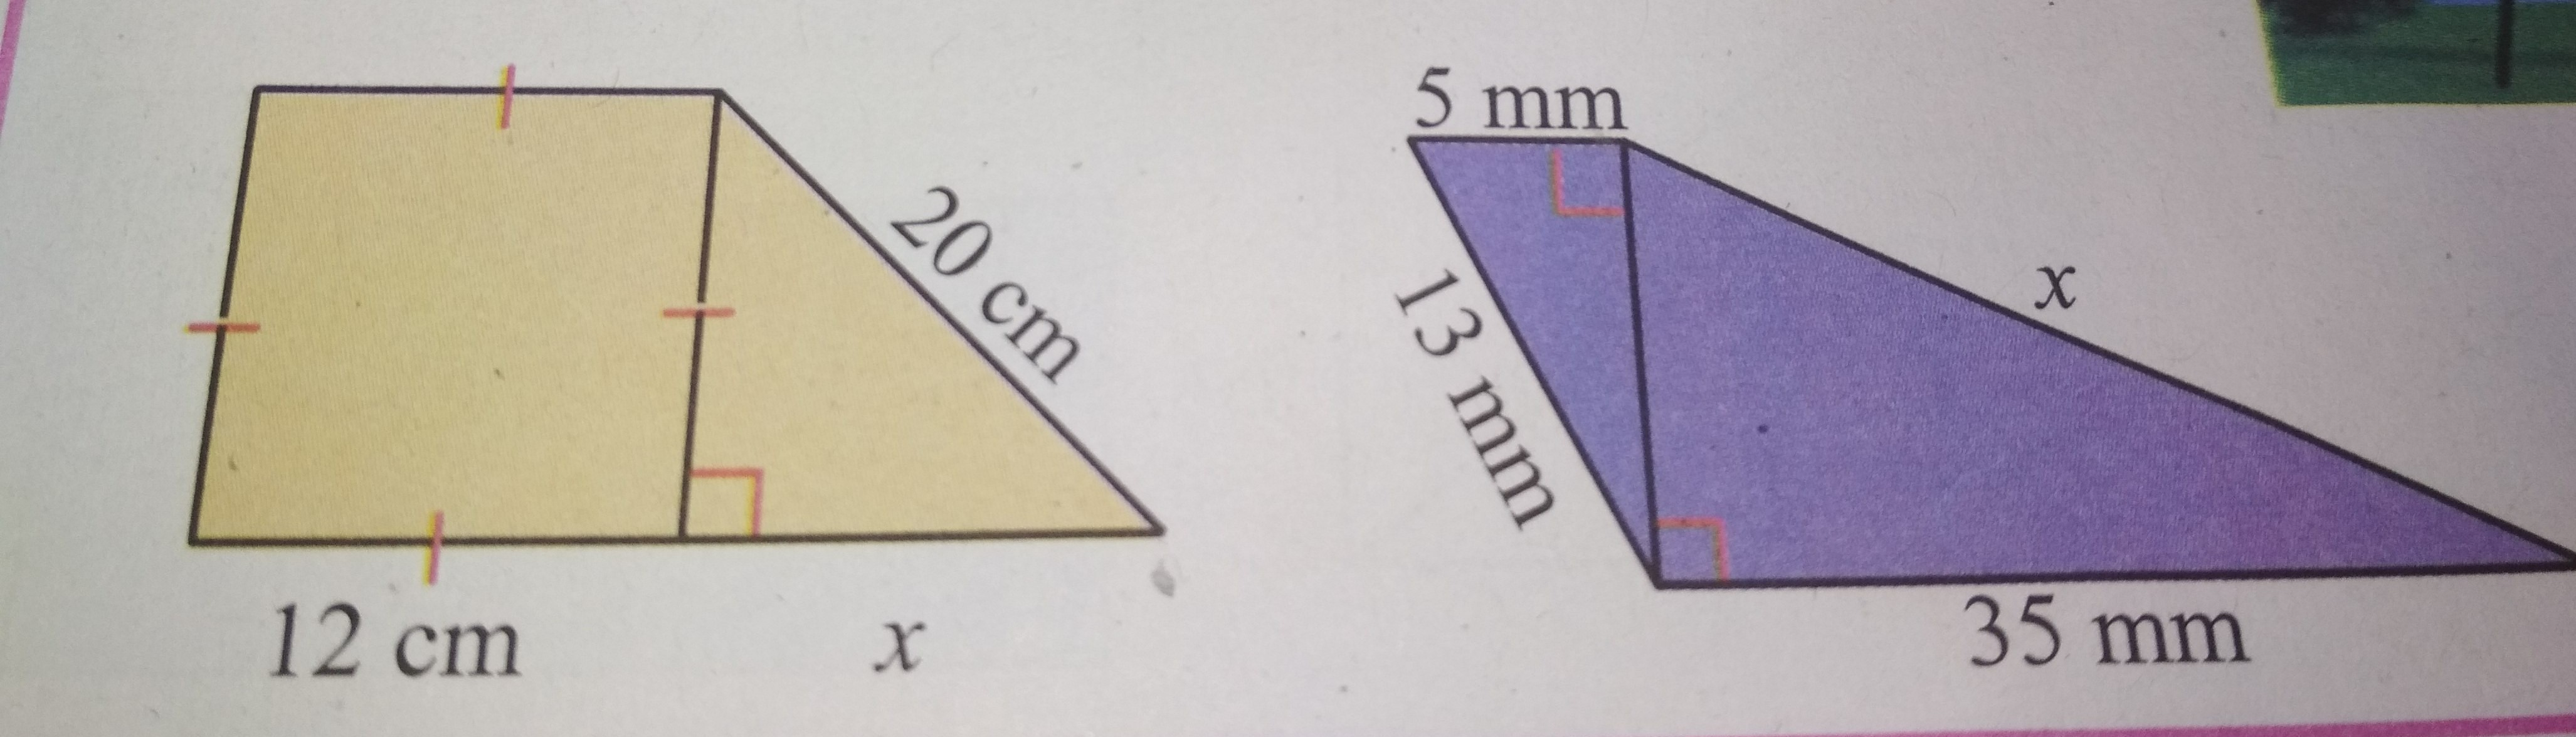 tentukan nilai x pada kedua gambar berikut. - Brainly.co.id